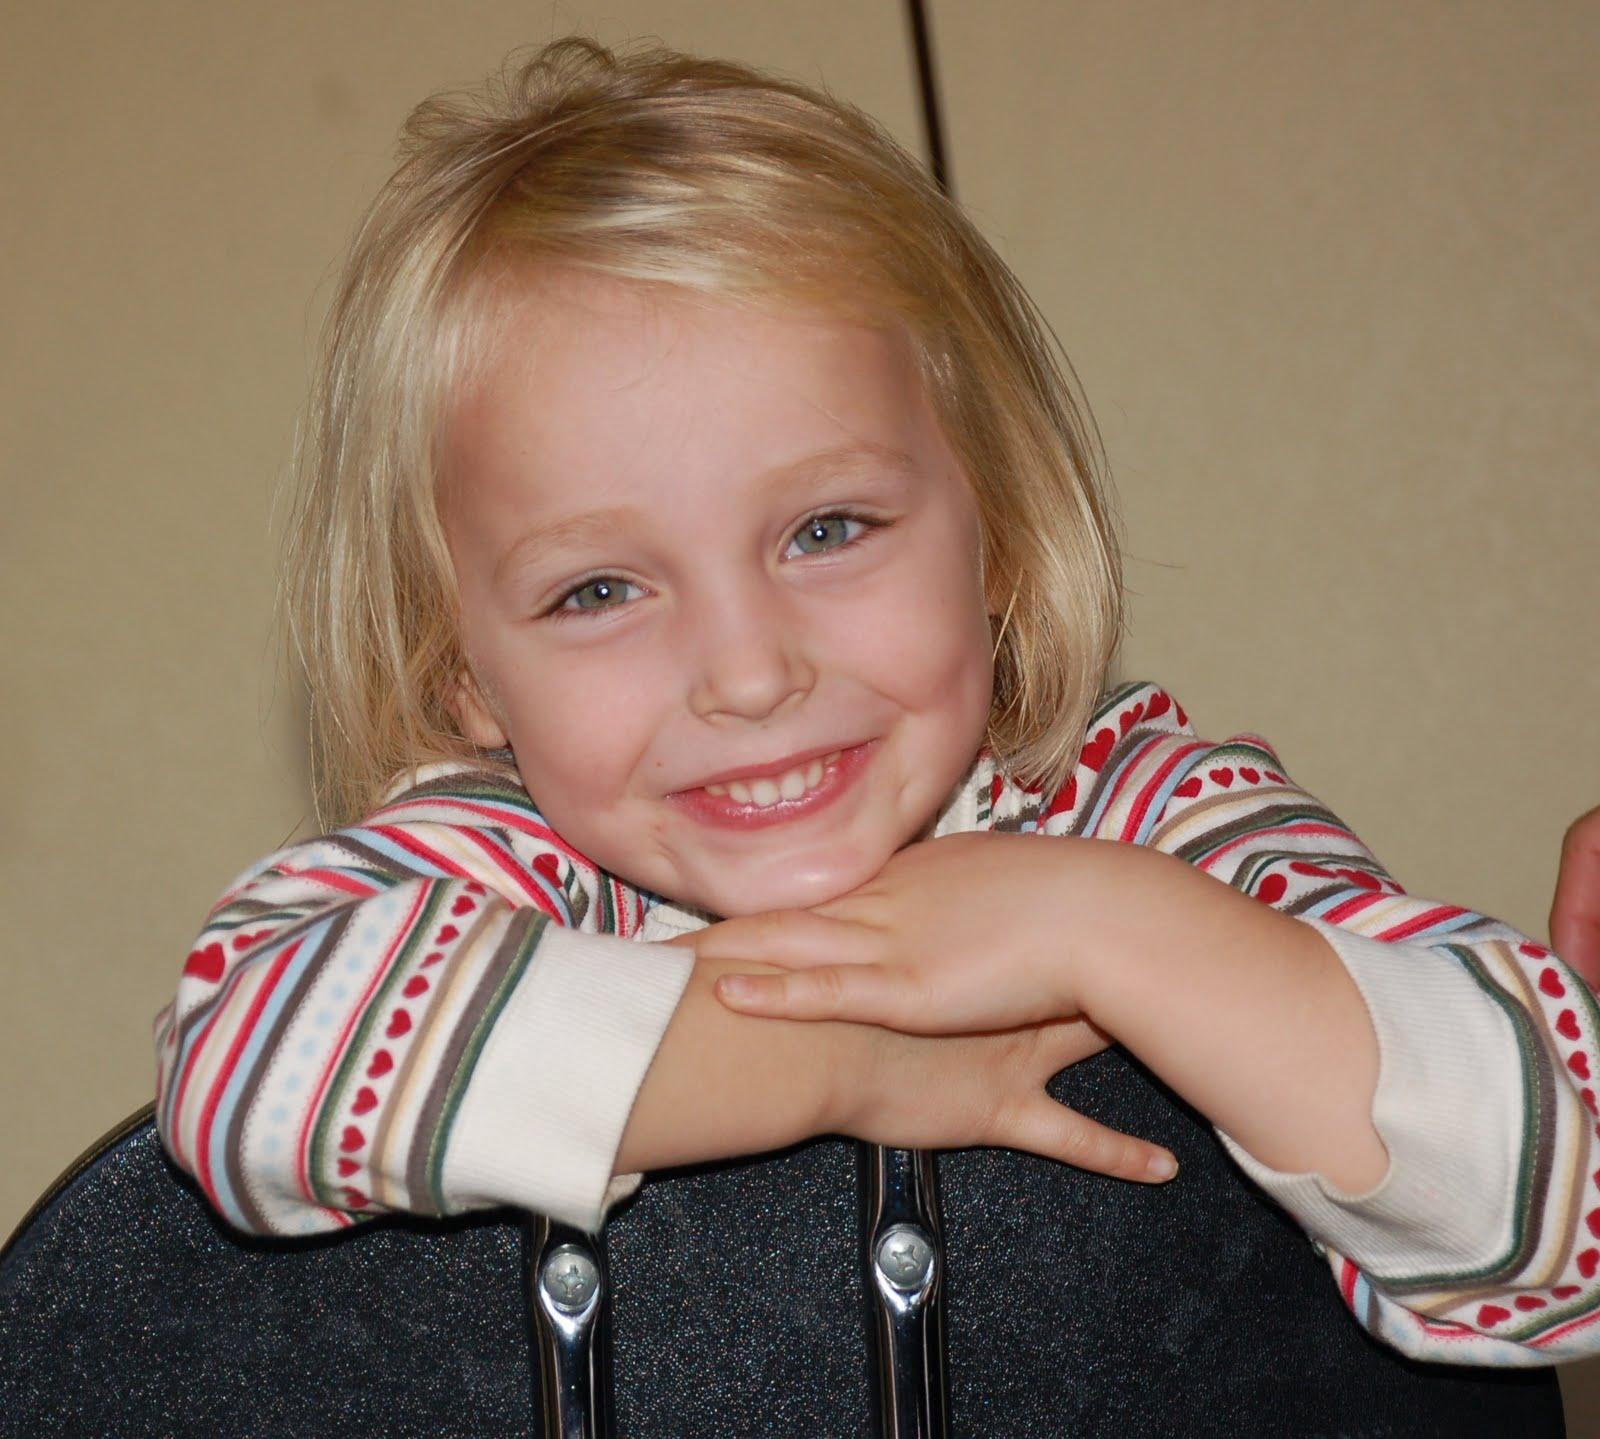 7 Year Old Girl Haircuts